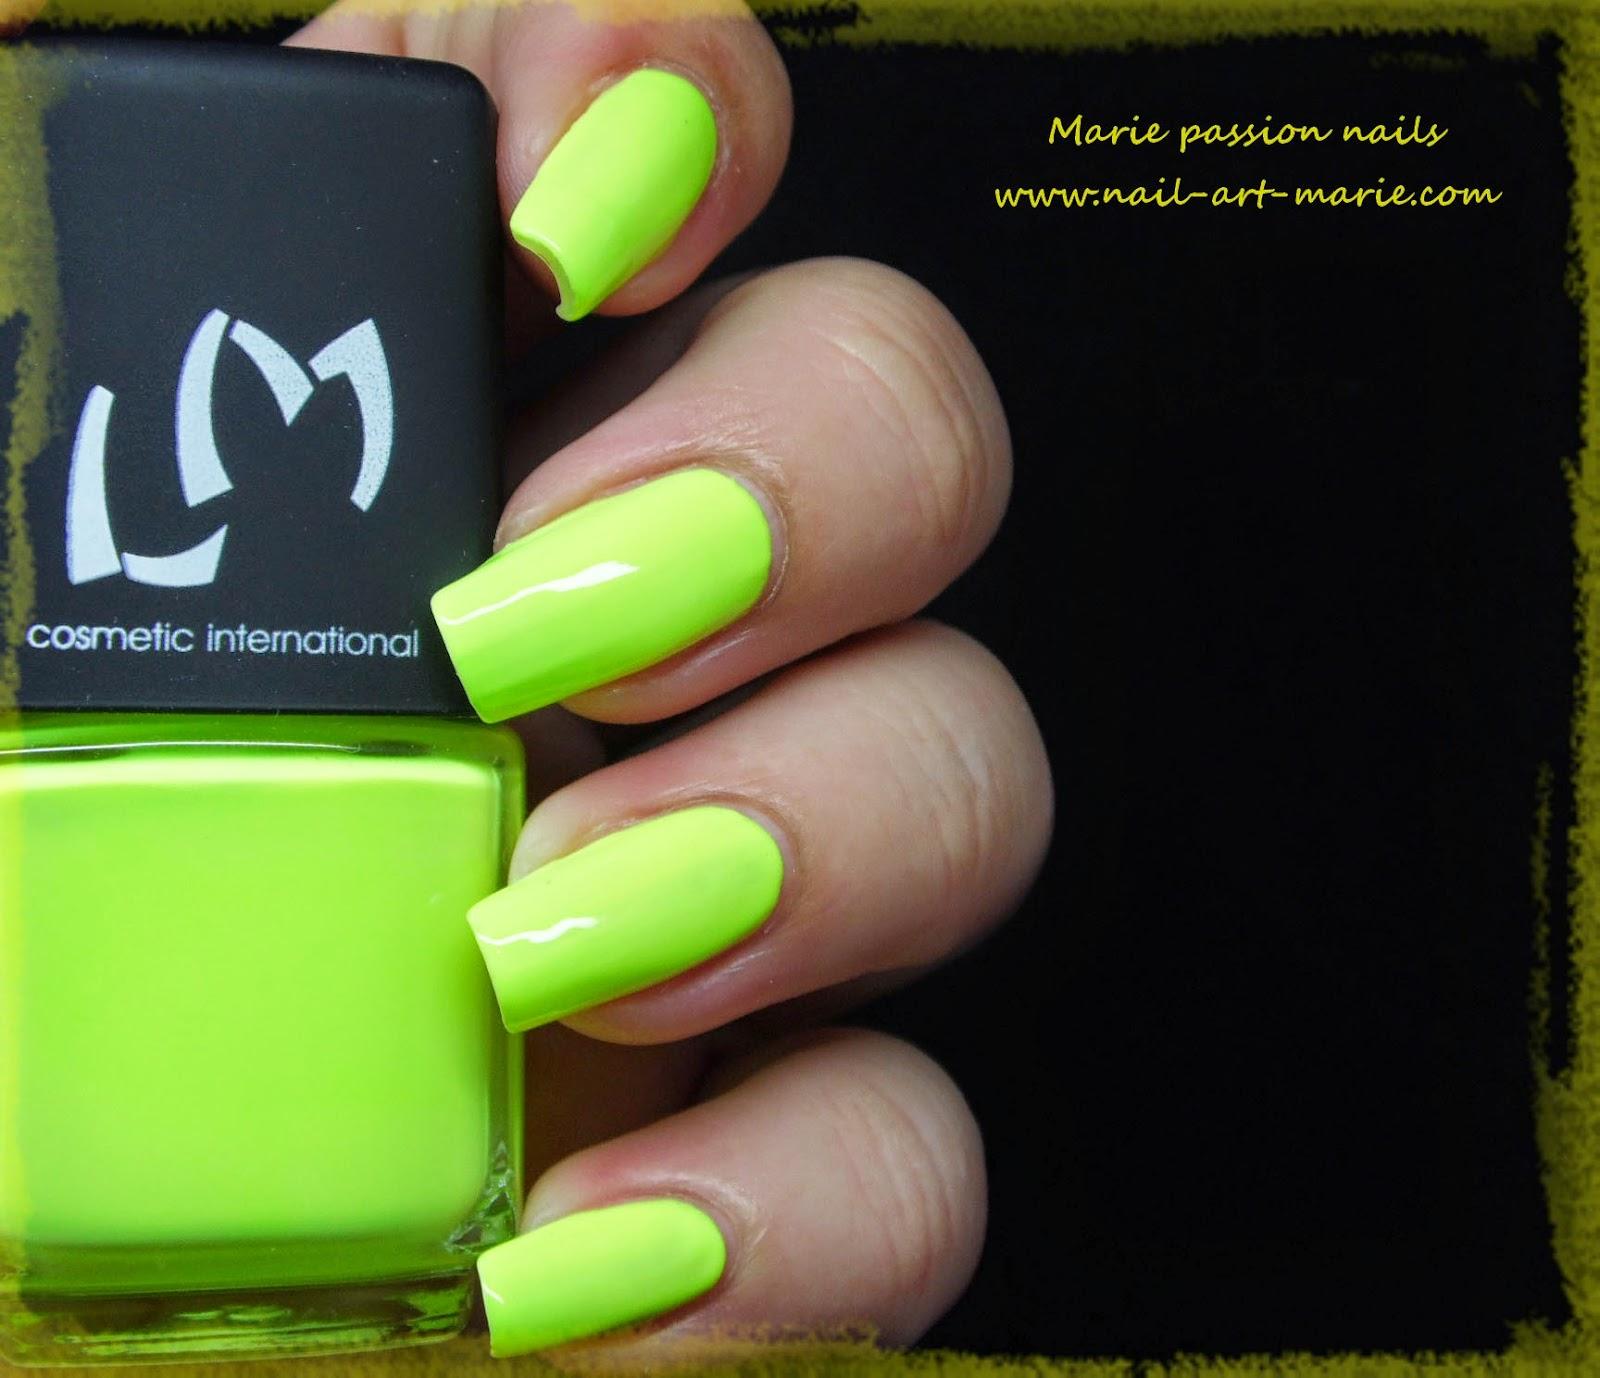 LM Cosmetic Yellow Submarine3